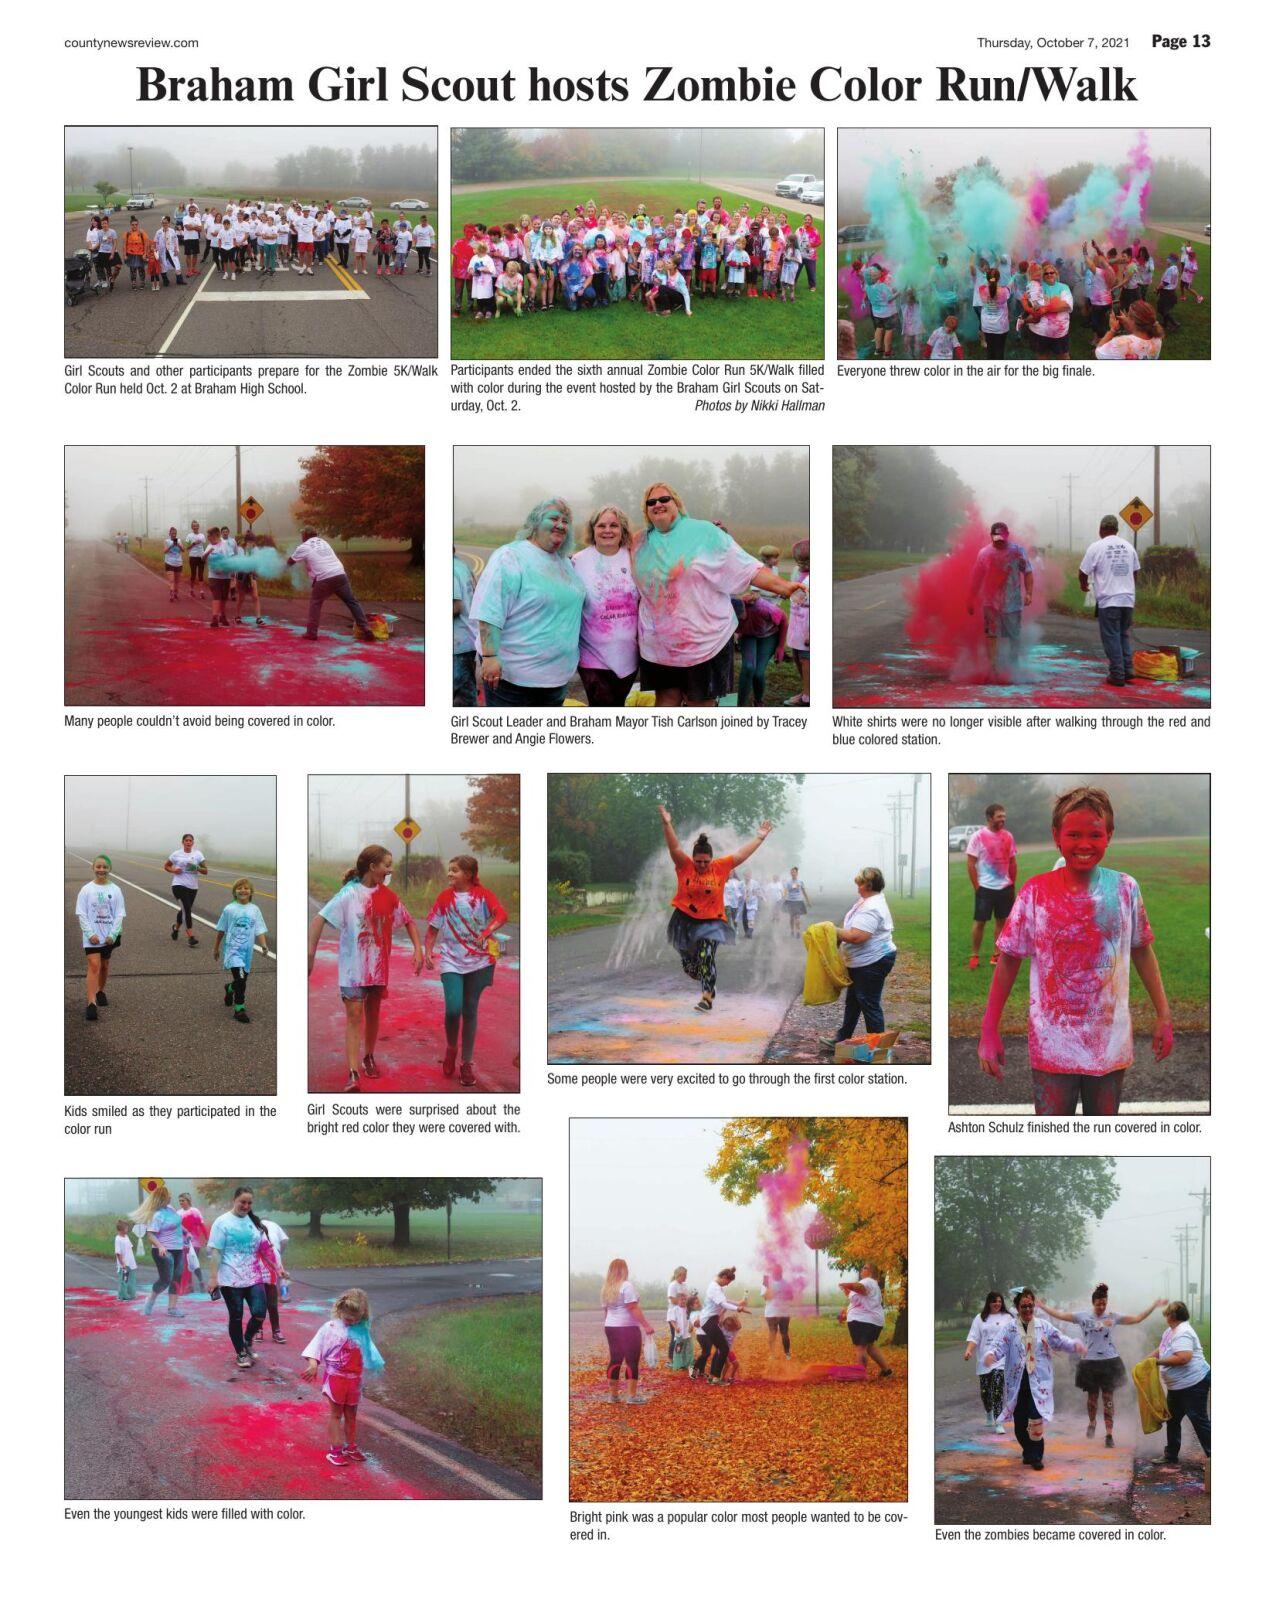 Braham Girl Scouts host Zombie Color Run/Walk